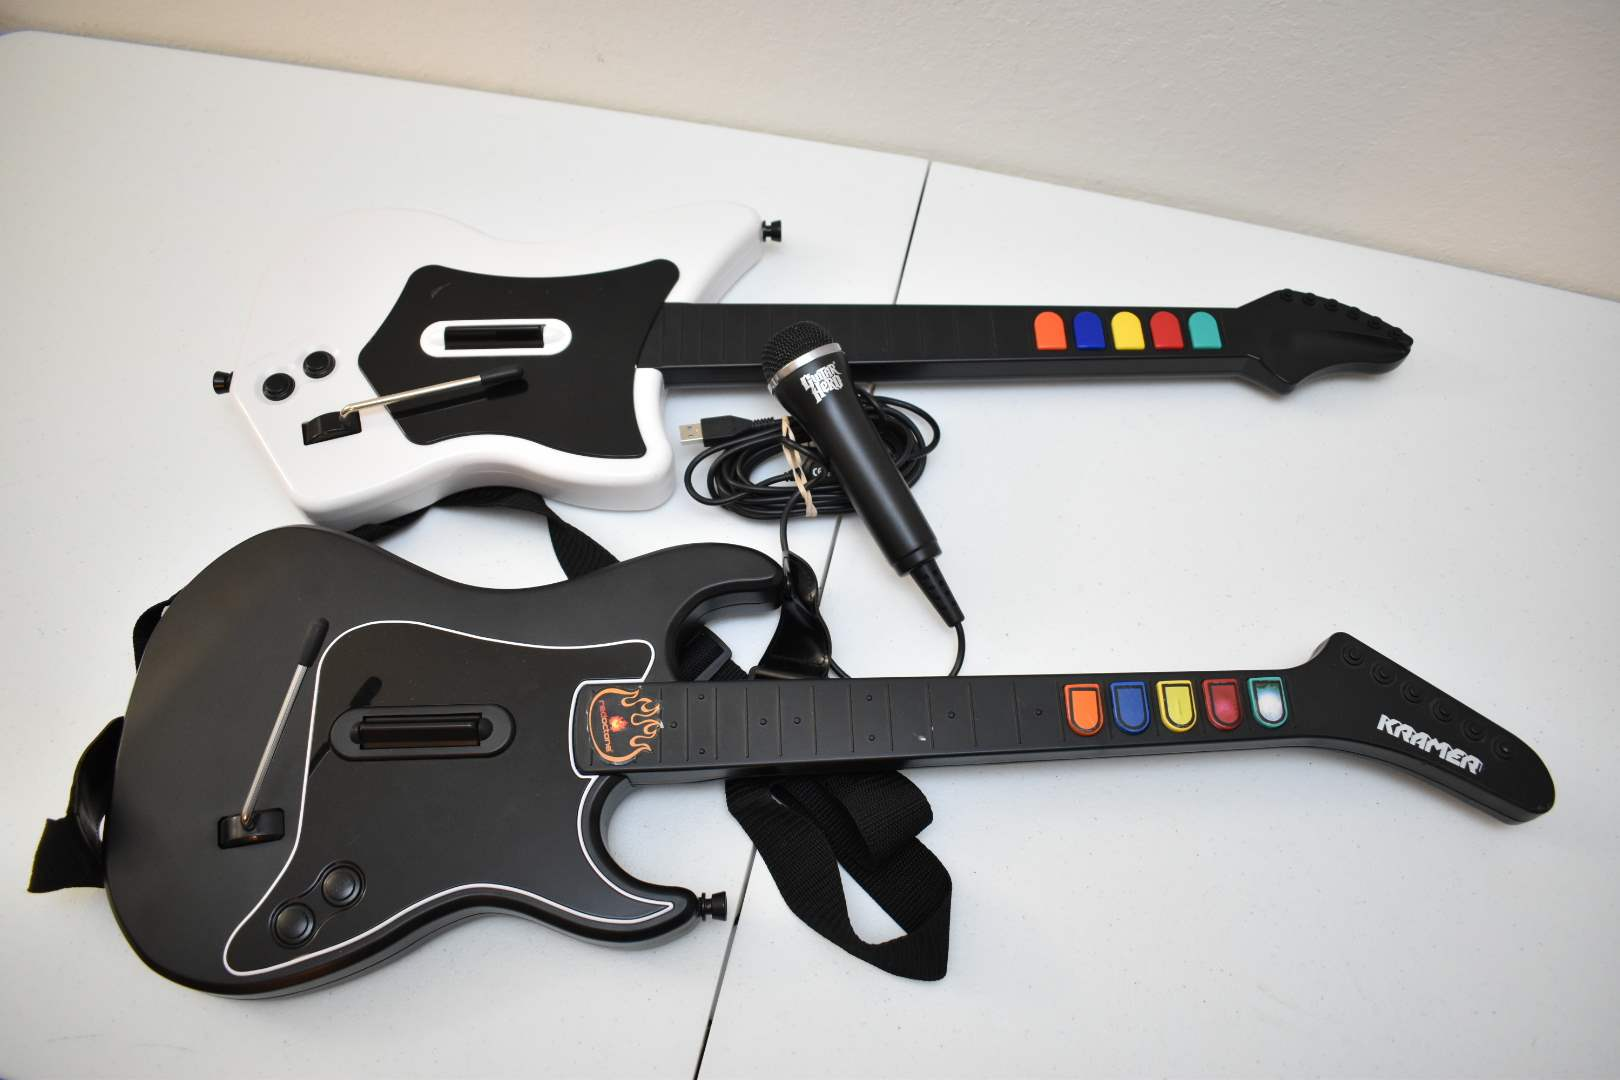 (2) Guitar Hero Guitars and USB Microphone